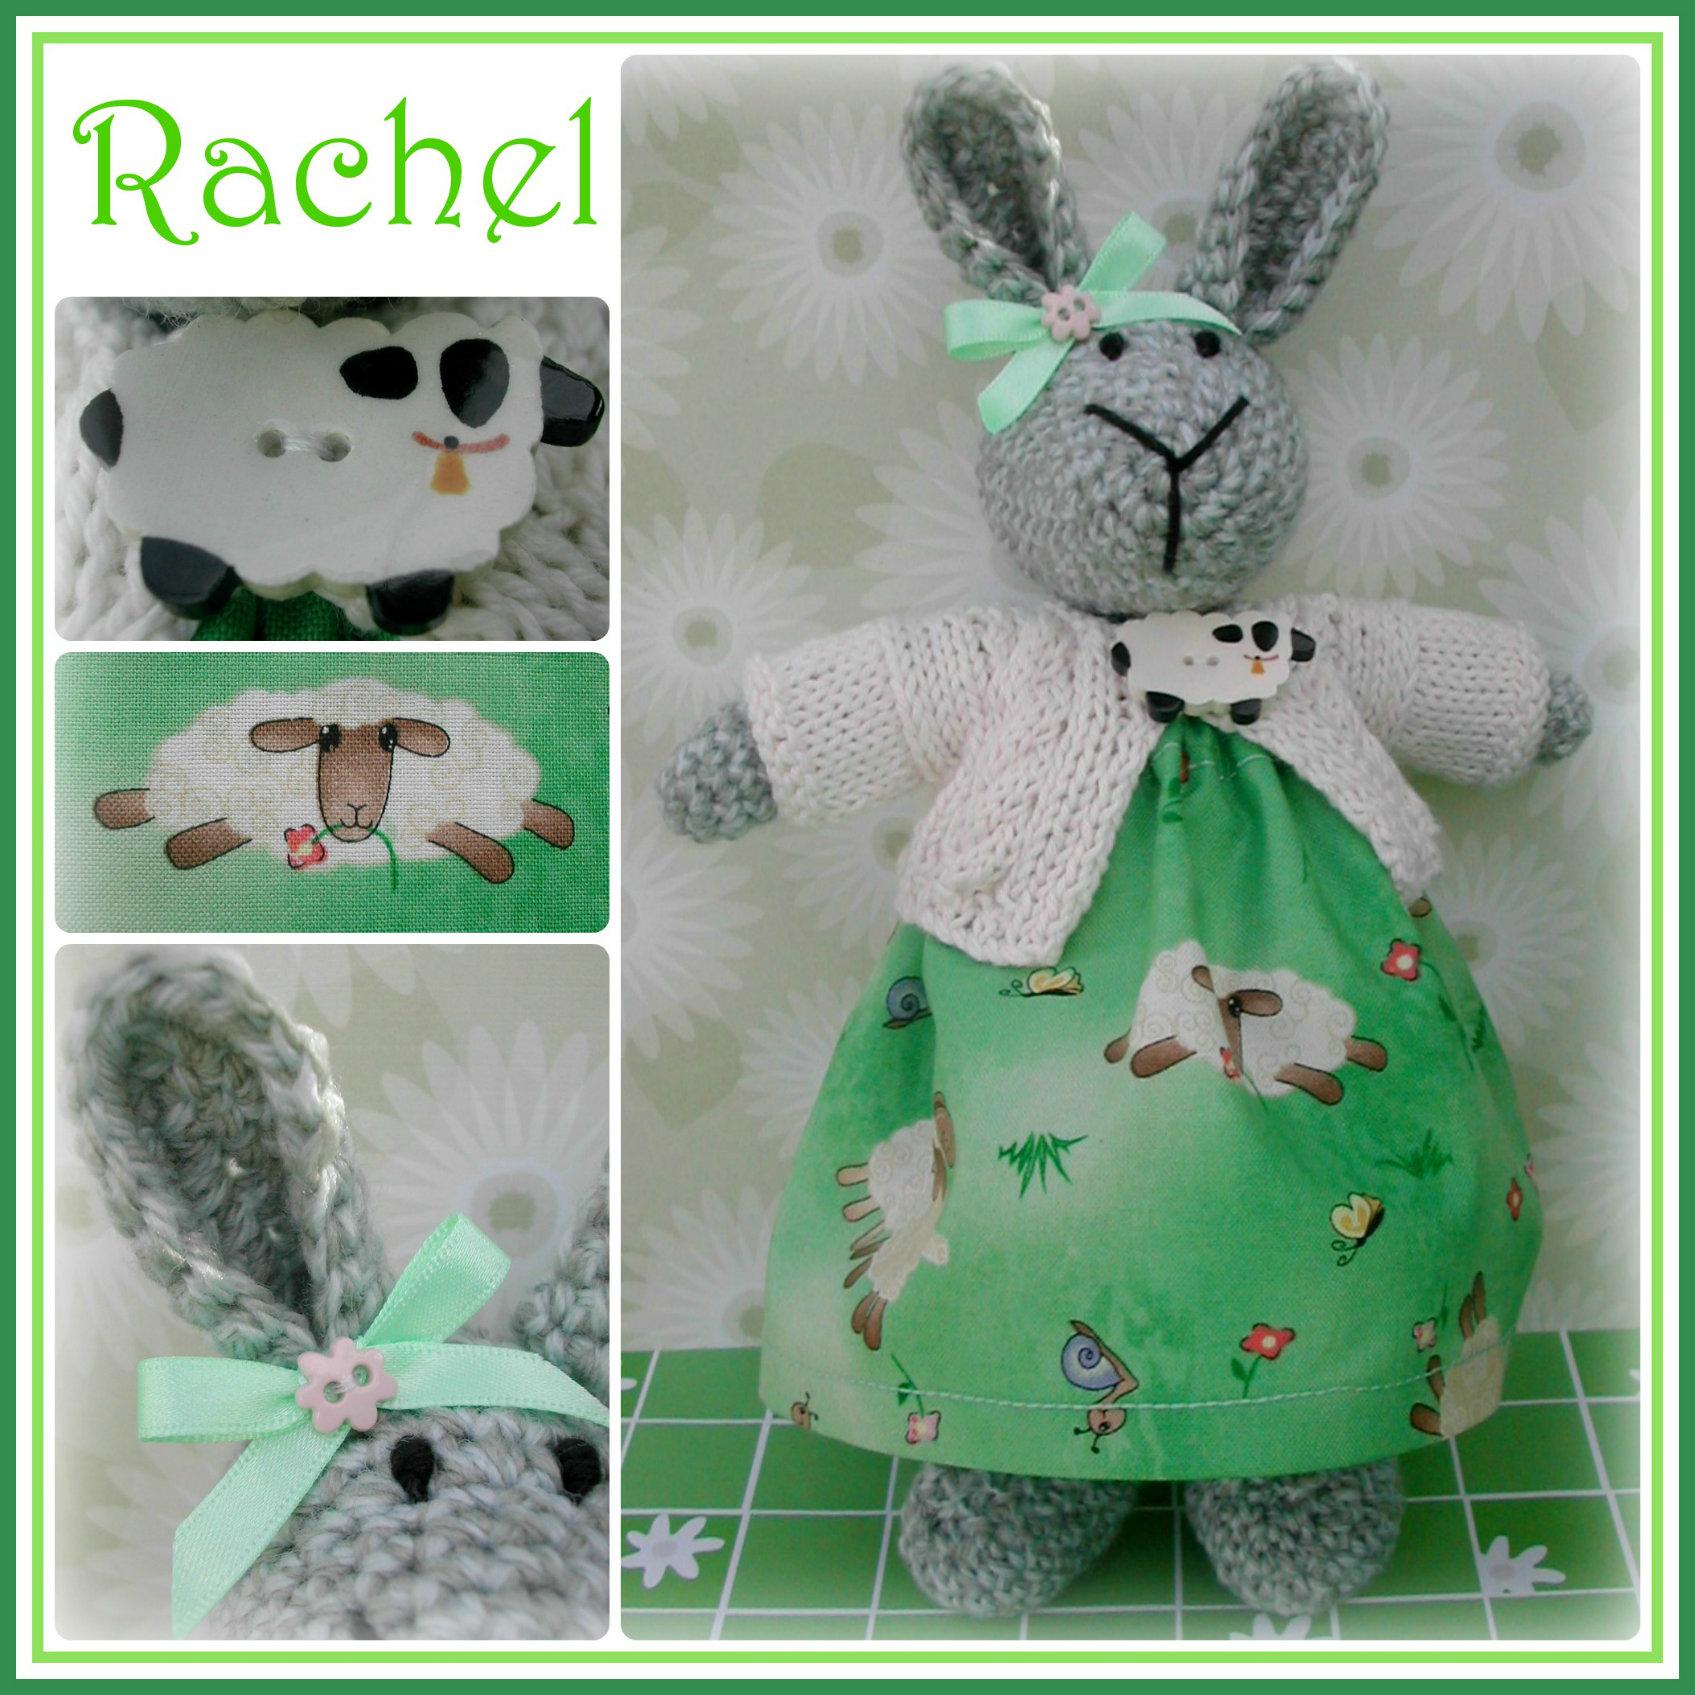 Rachel Collage